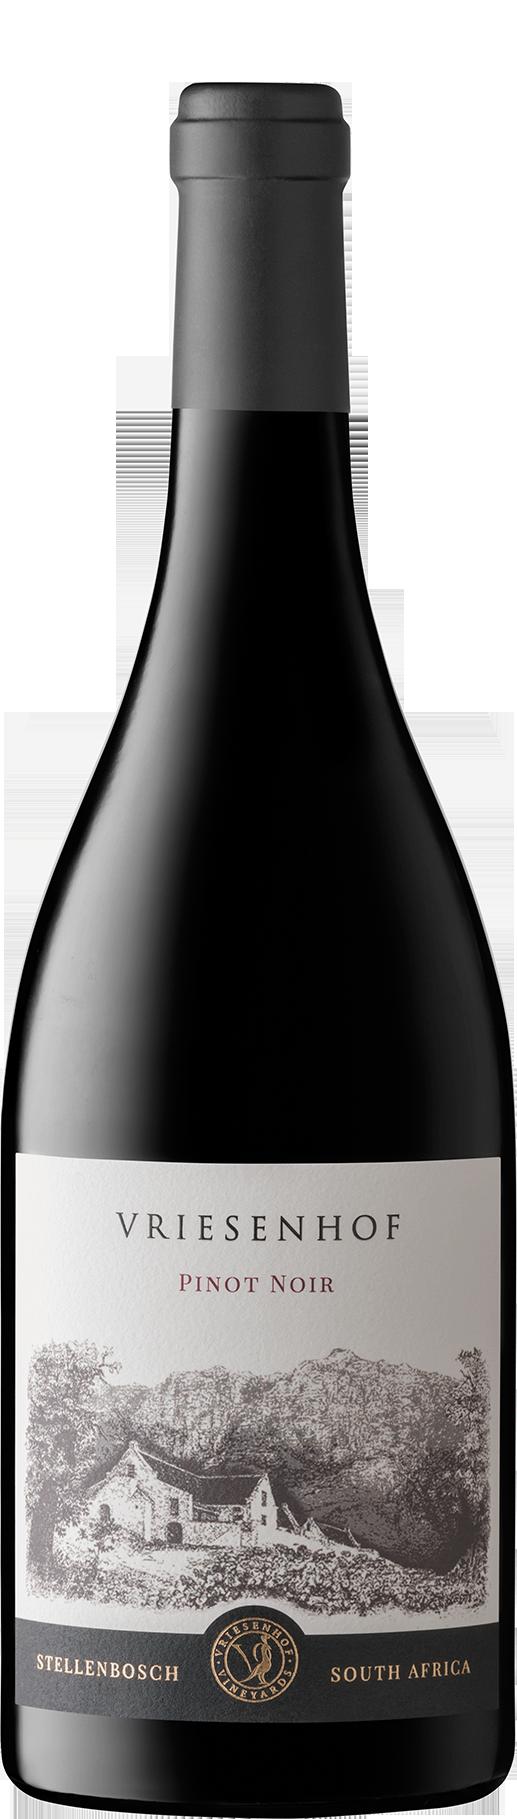 Vriesenhof Pinot Noir 2016